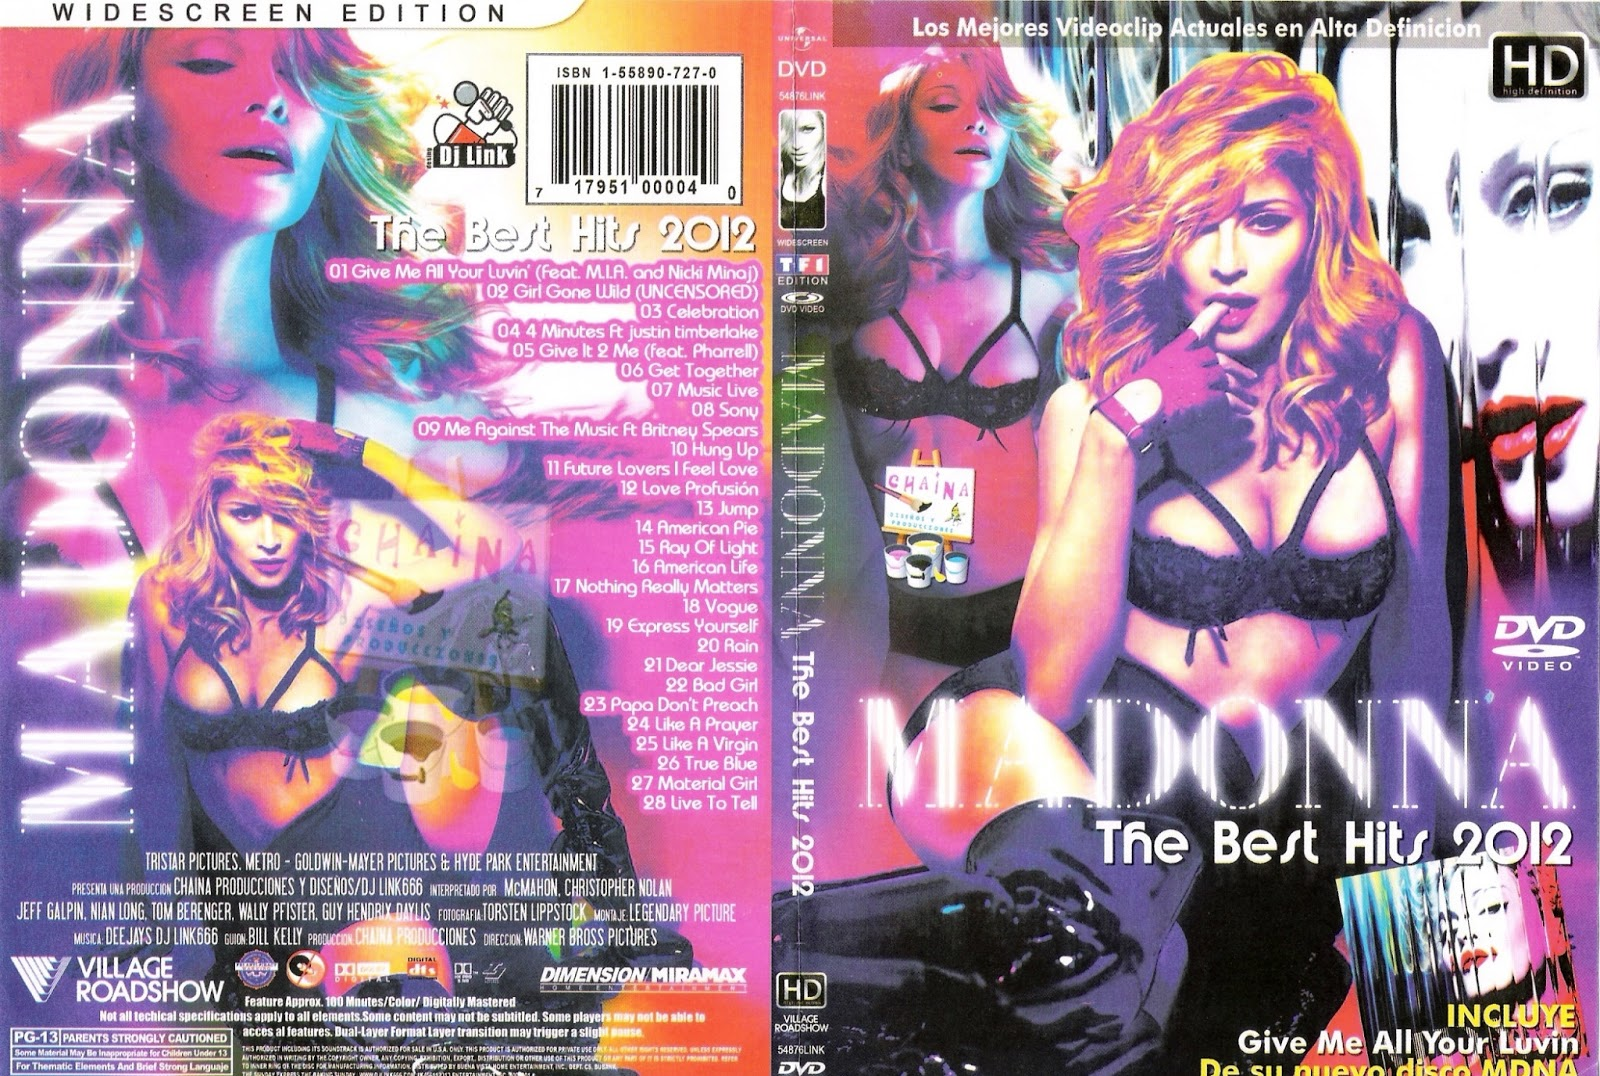 http://1.bp.blogspot.com/-Rj_5w_J9crM/UOX1EIWLUHI/AAAAAAAAGow/Ljcf7voUdZo/s1600/PROMO+ONLY+03+-+MADONNA+THE+BEST+HITS.jpg